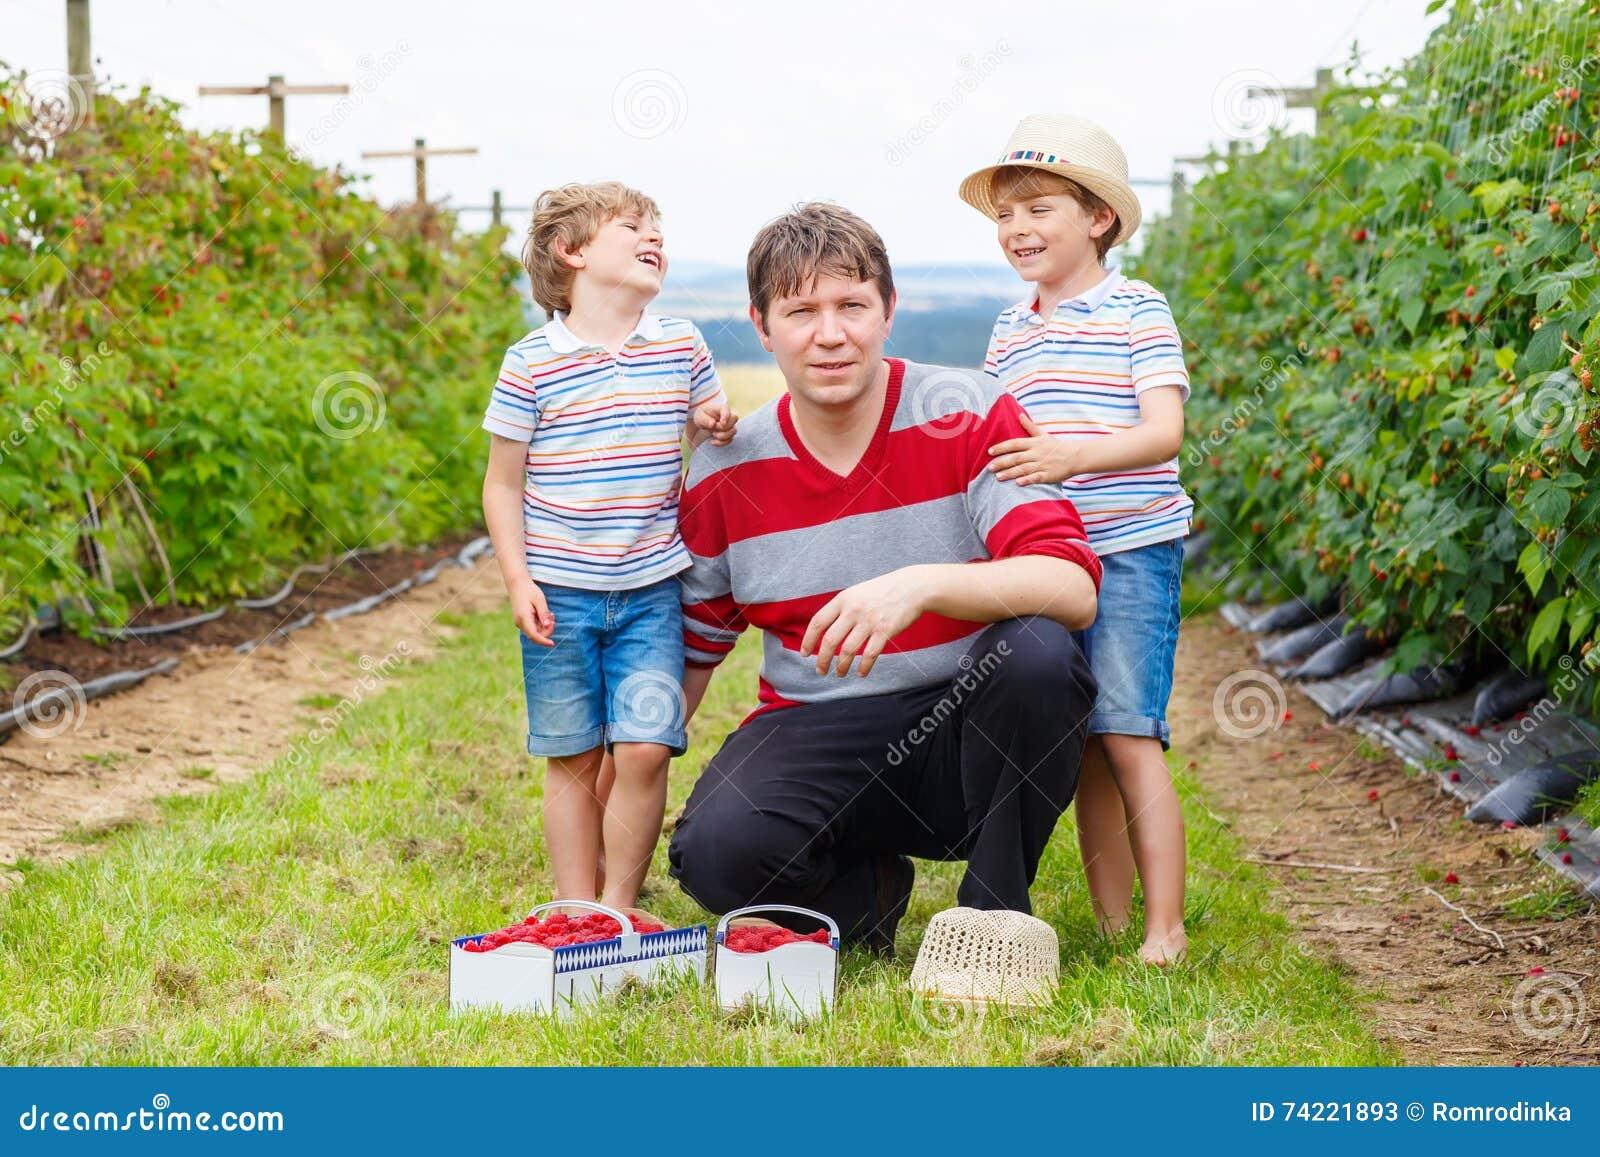 Two little kid boys and father having fun on raspberry farm